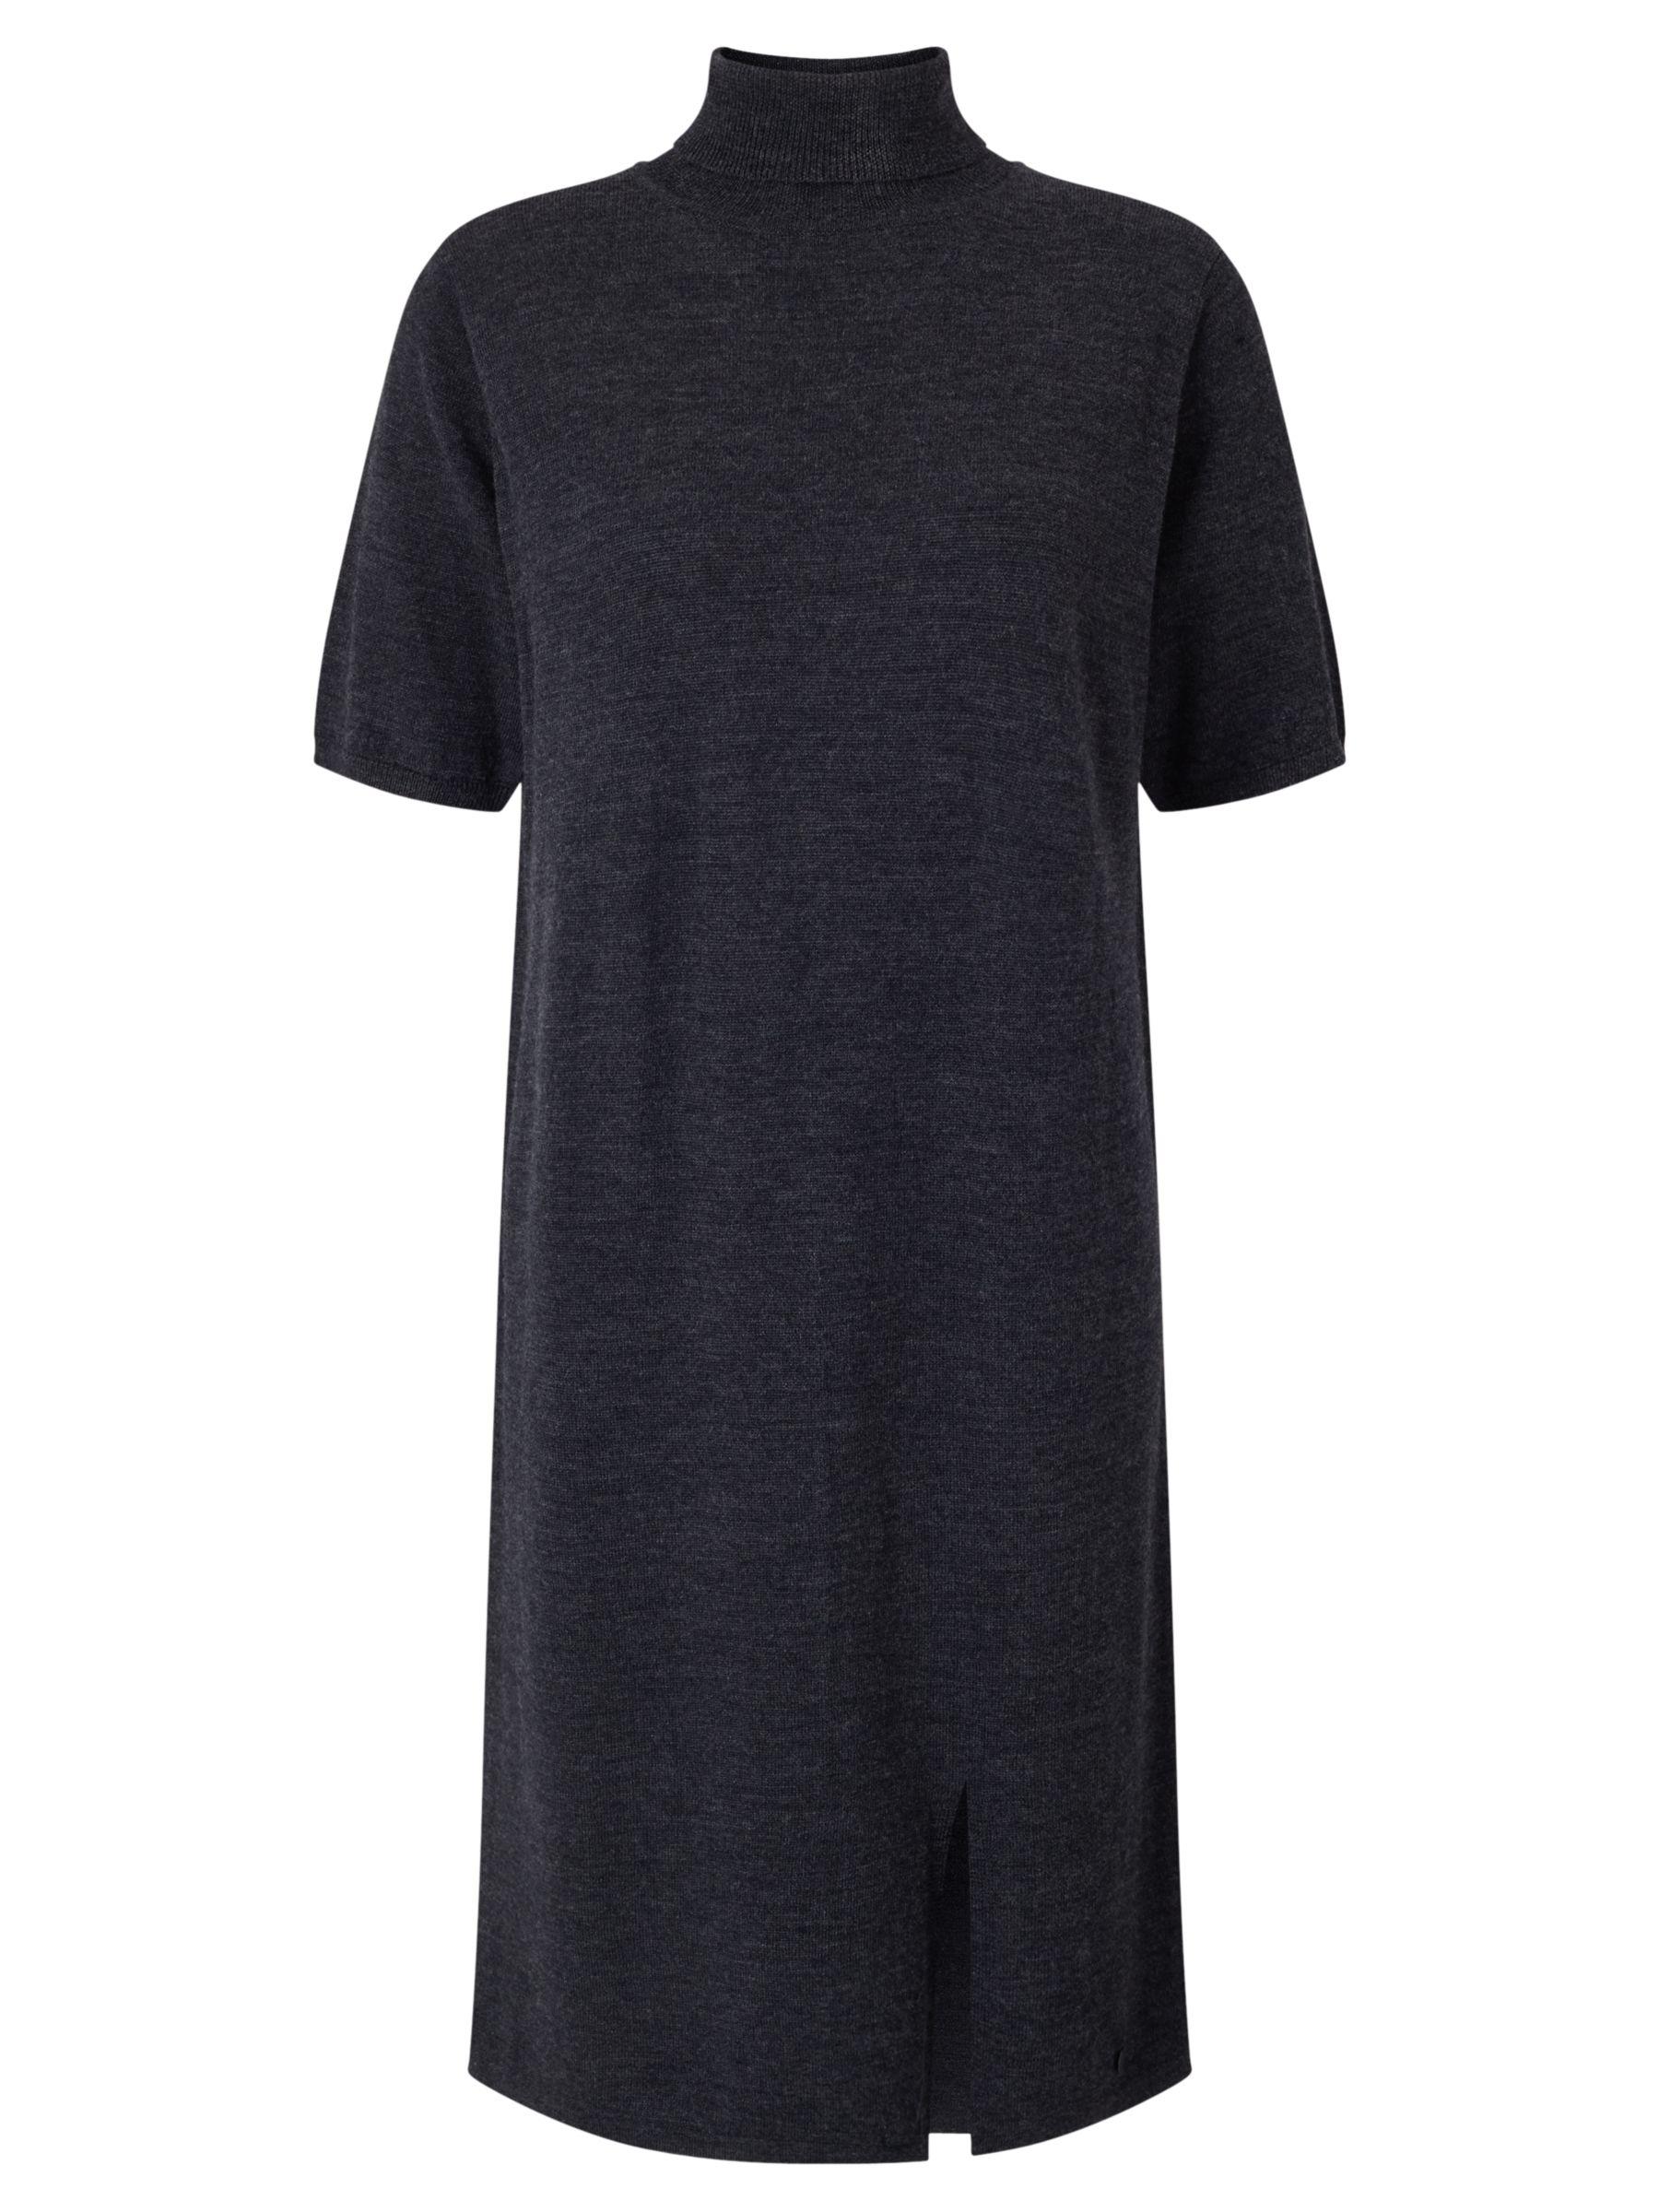 Numph Numph Maney Merino Wool Dress, India Ink